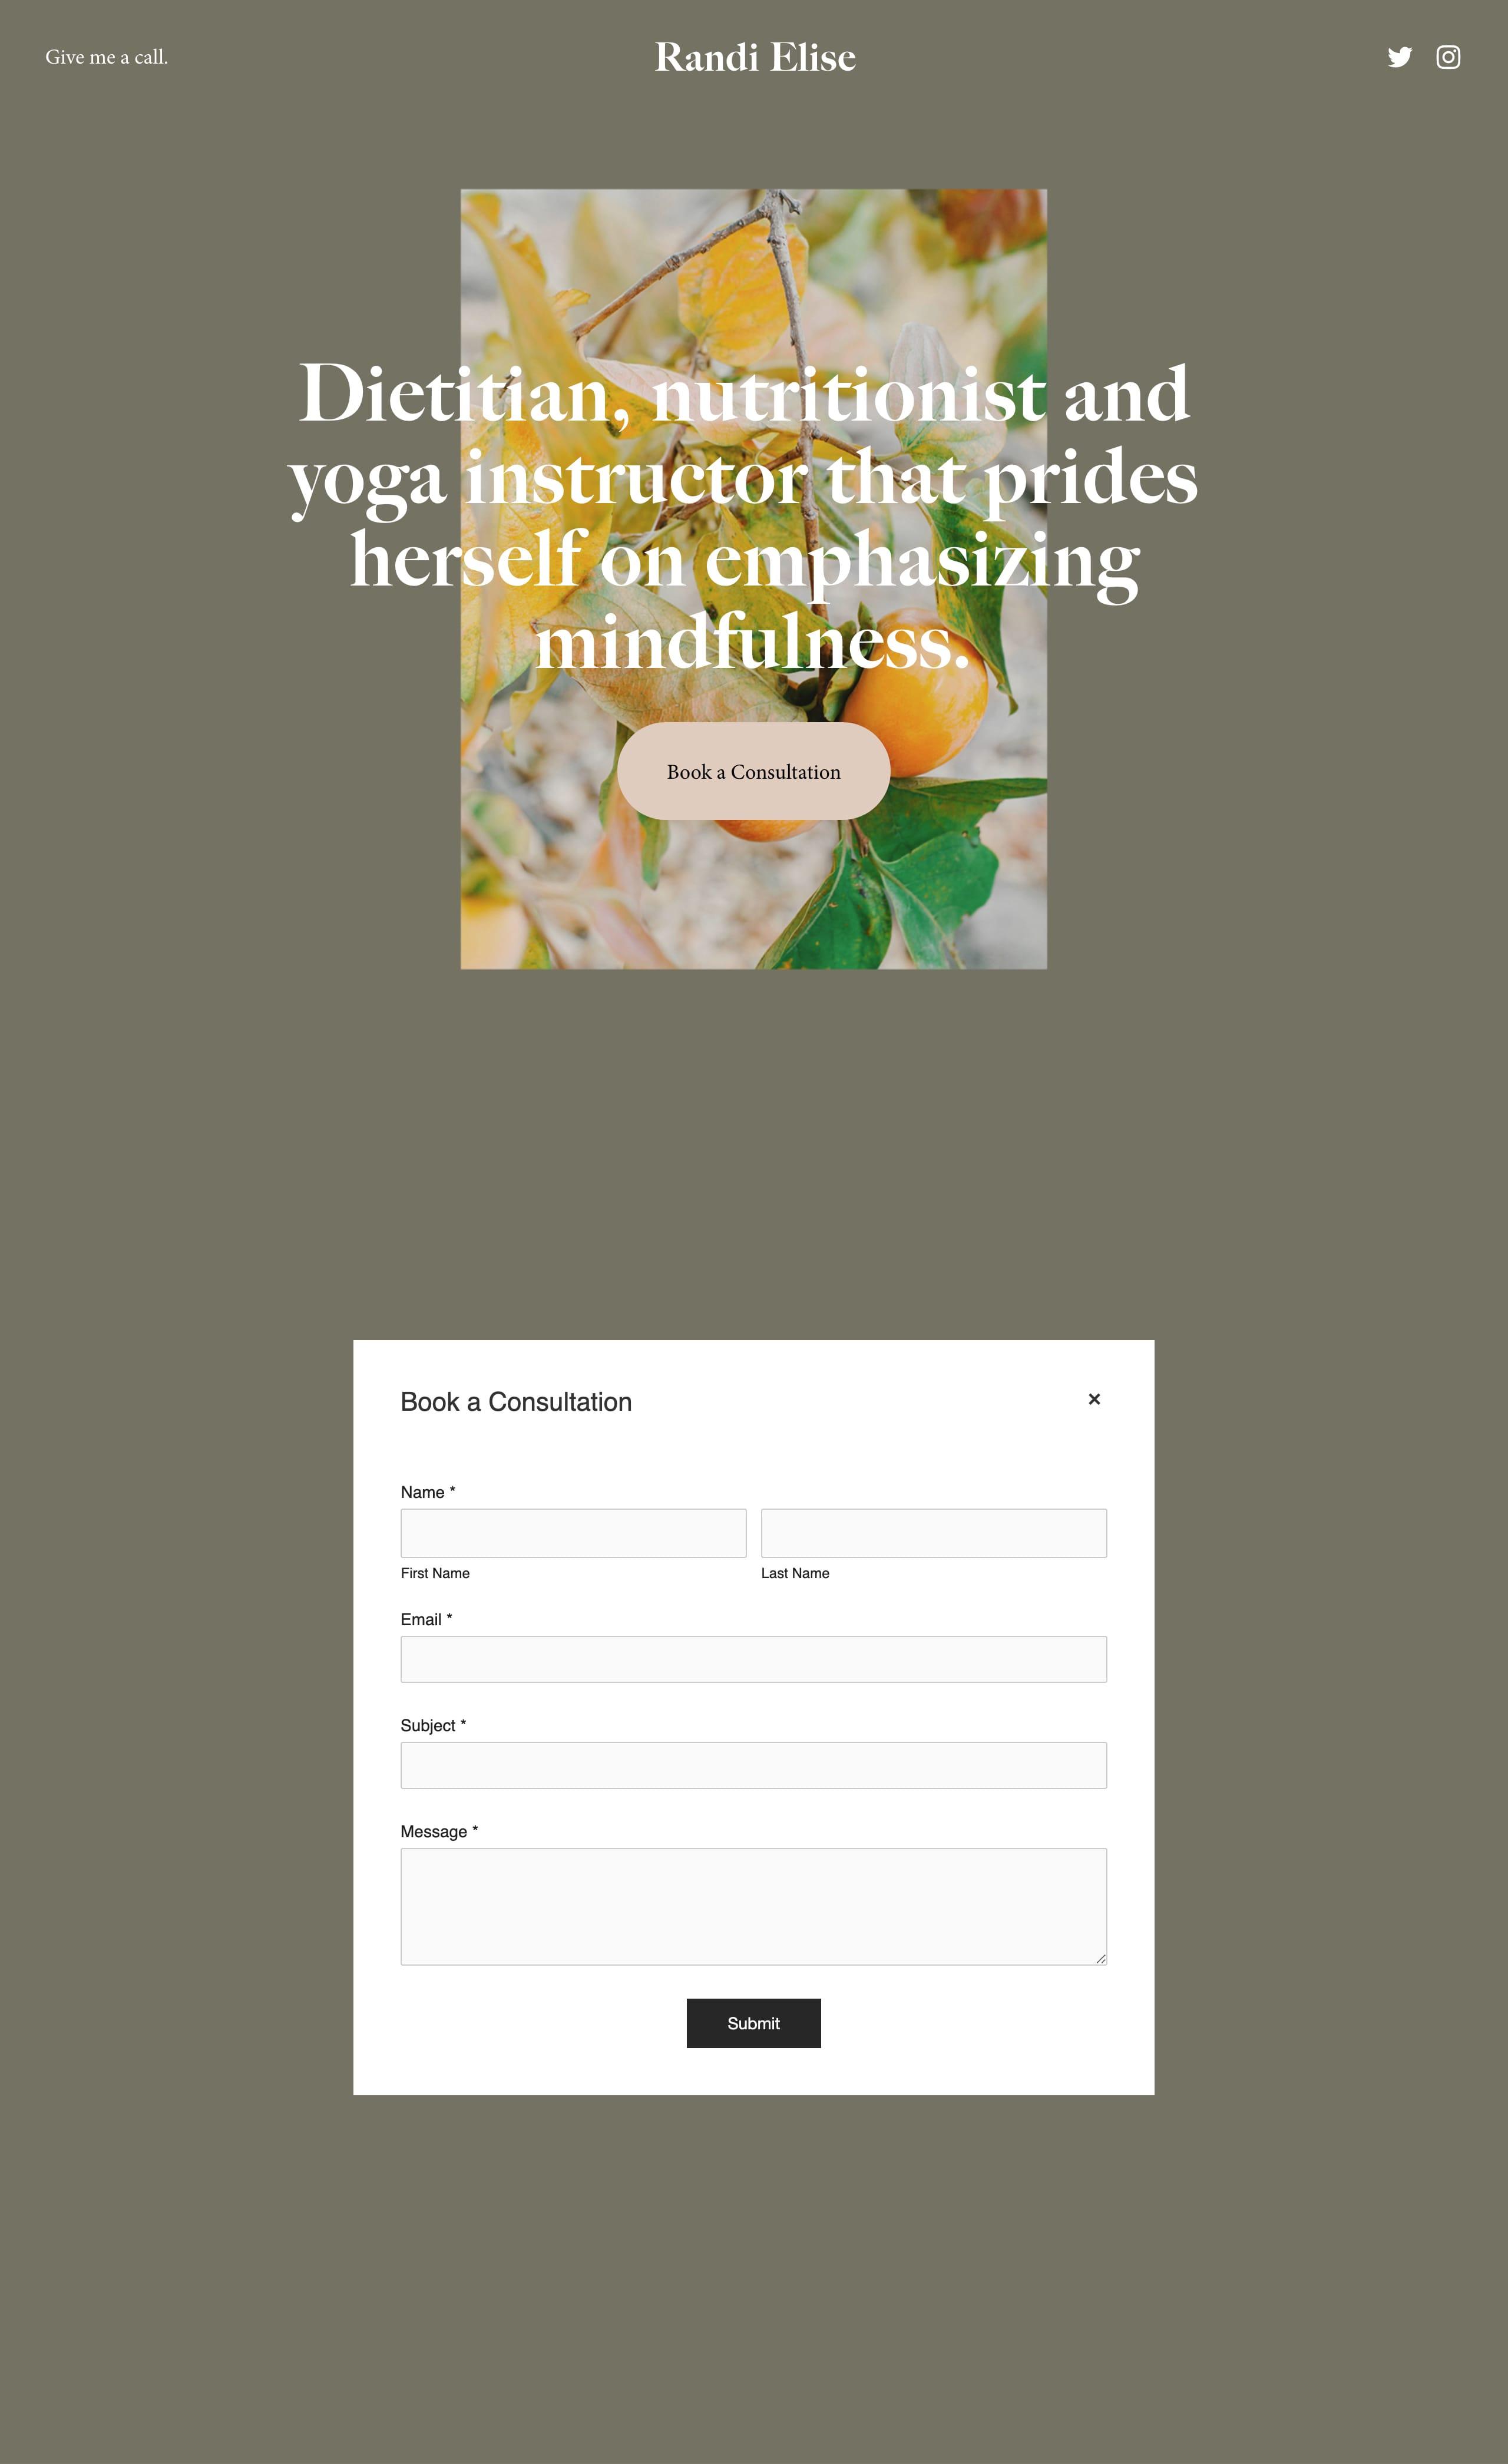 Randi Website Screenshot